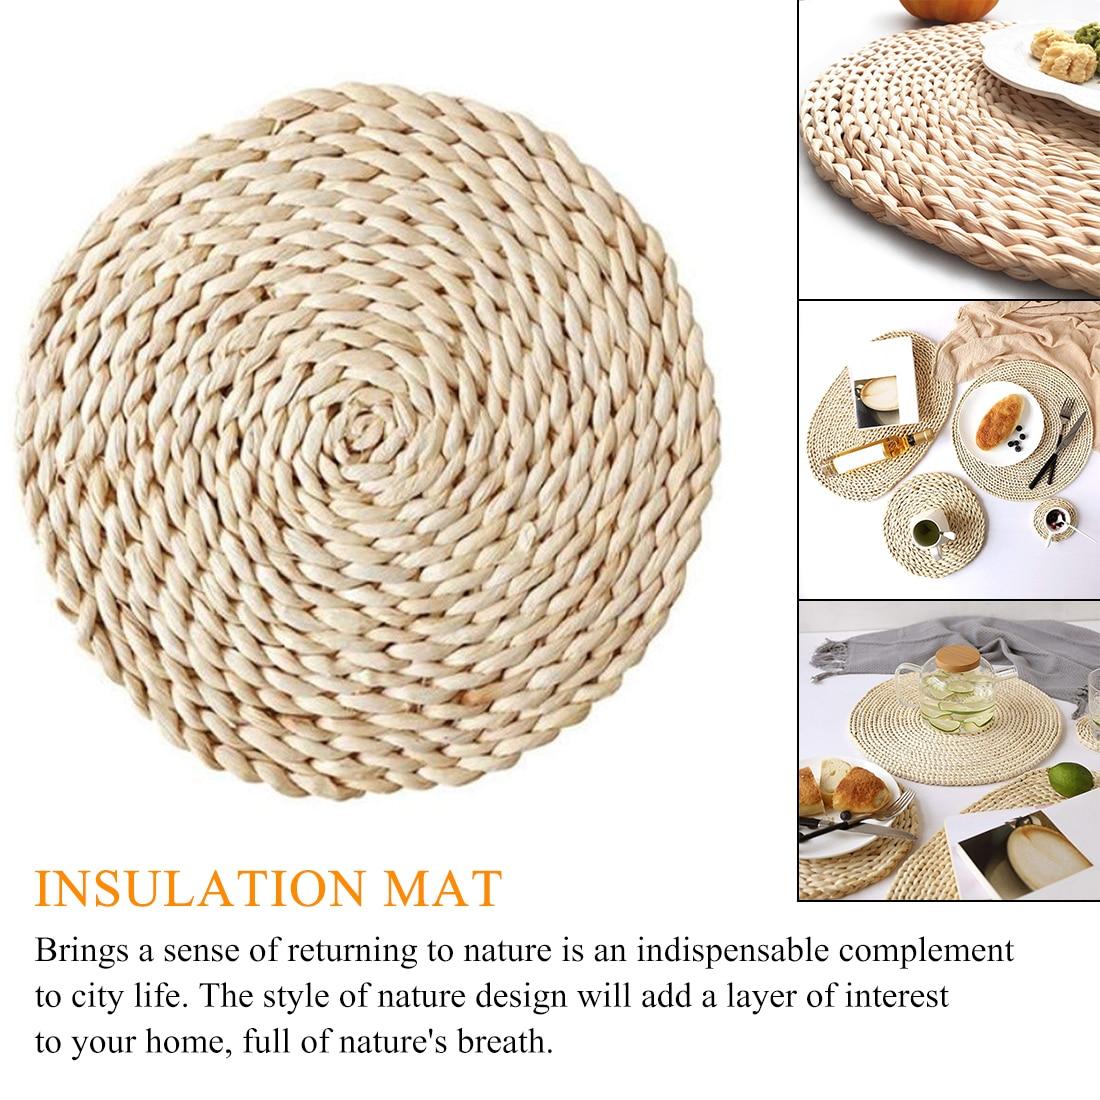 Coffee Drink Tea Cup Table Placemats Mug Coaster Corn Fur Woven